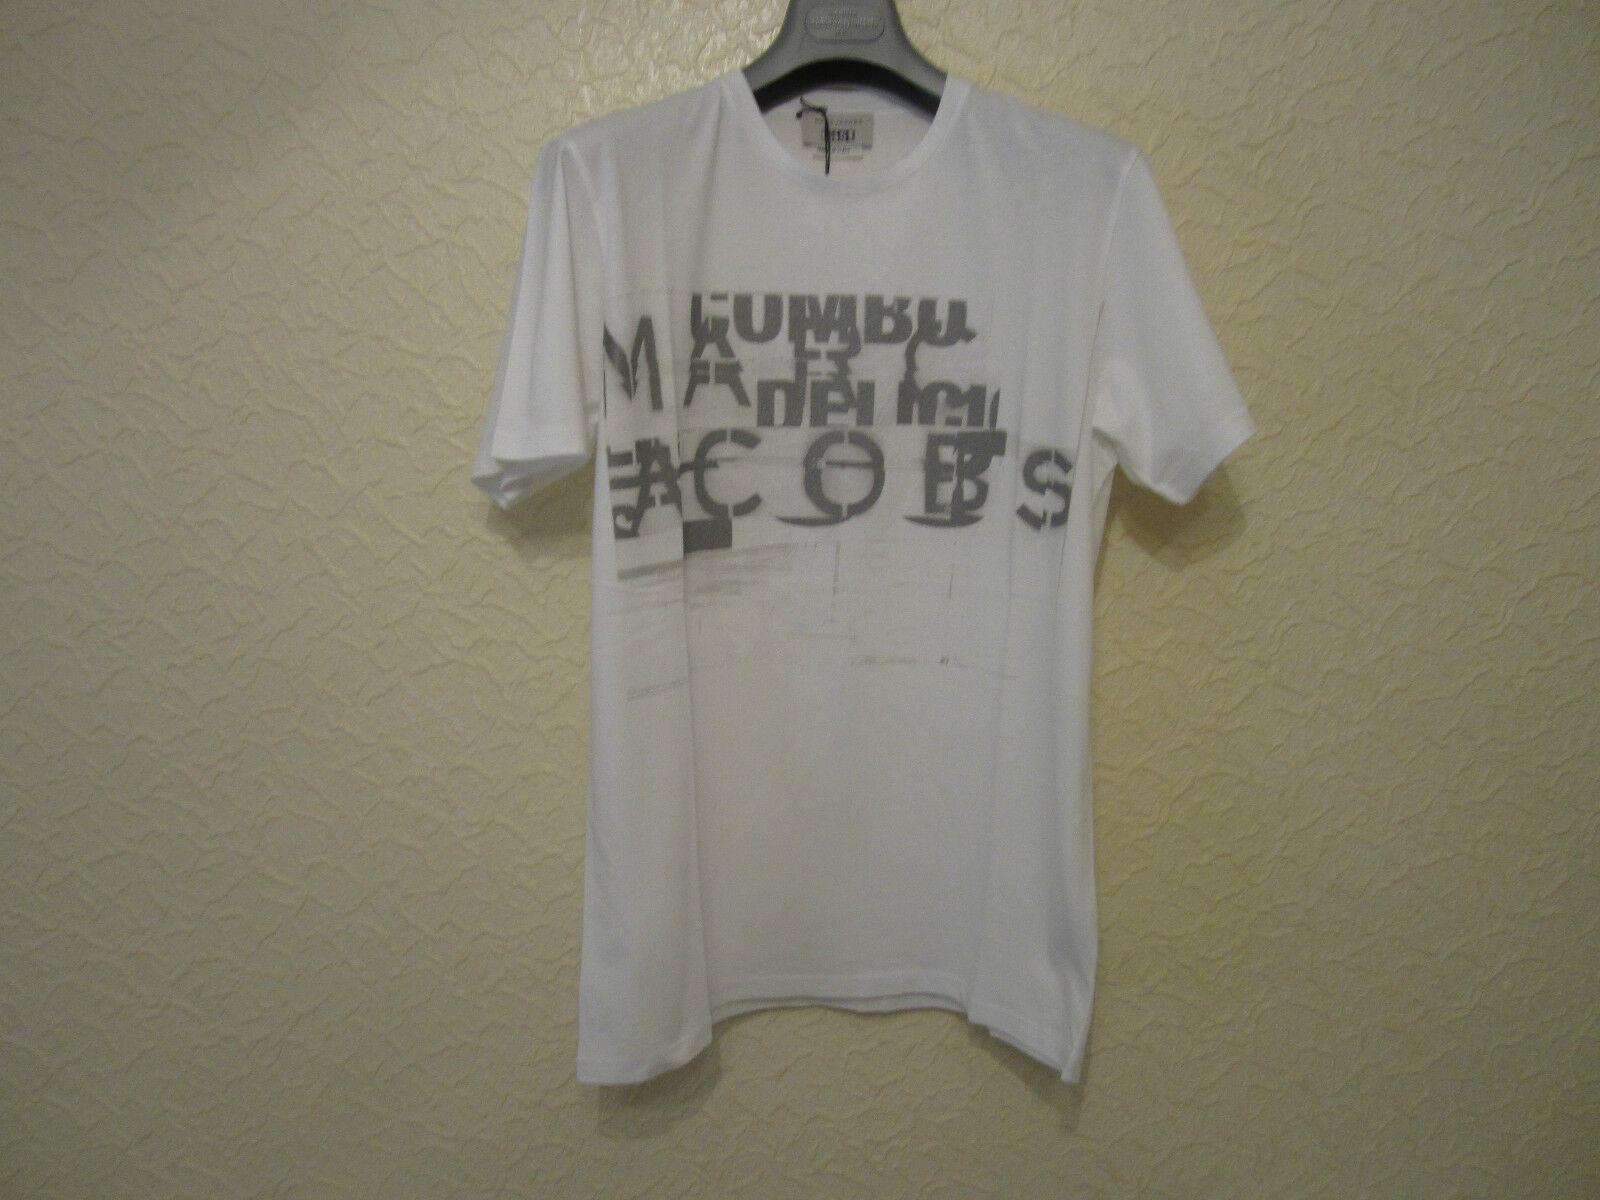 Marc JACOBS Stampato T-shirt di Cotone